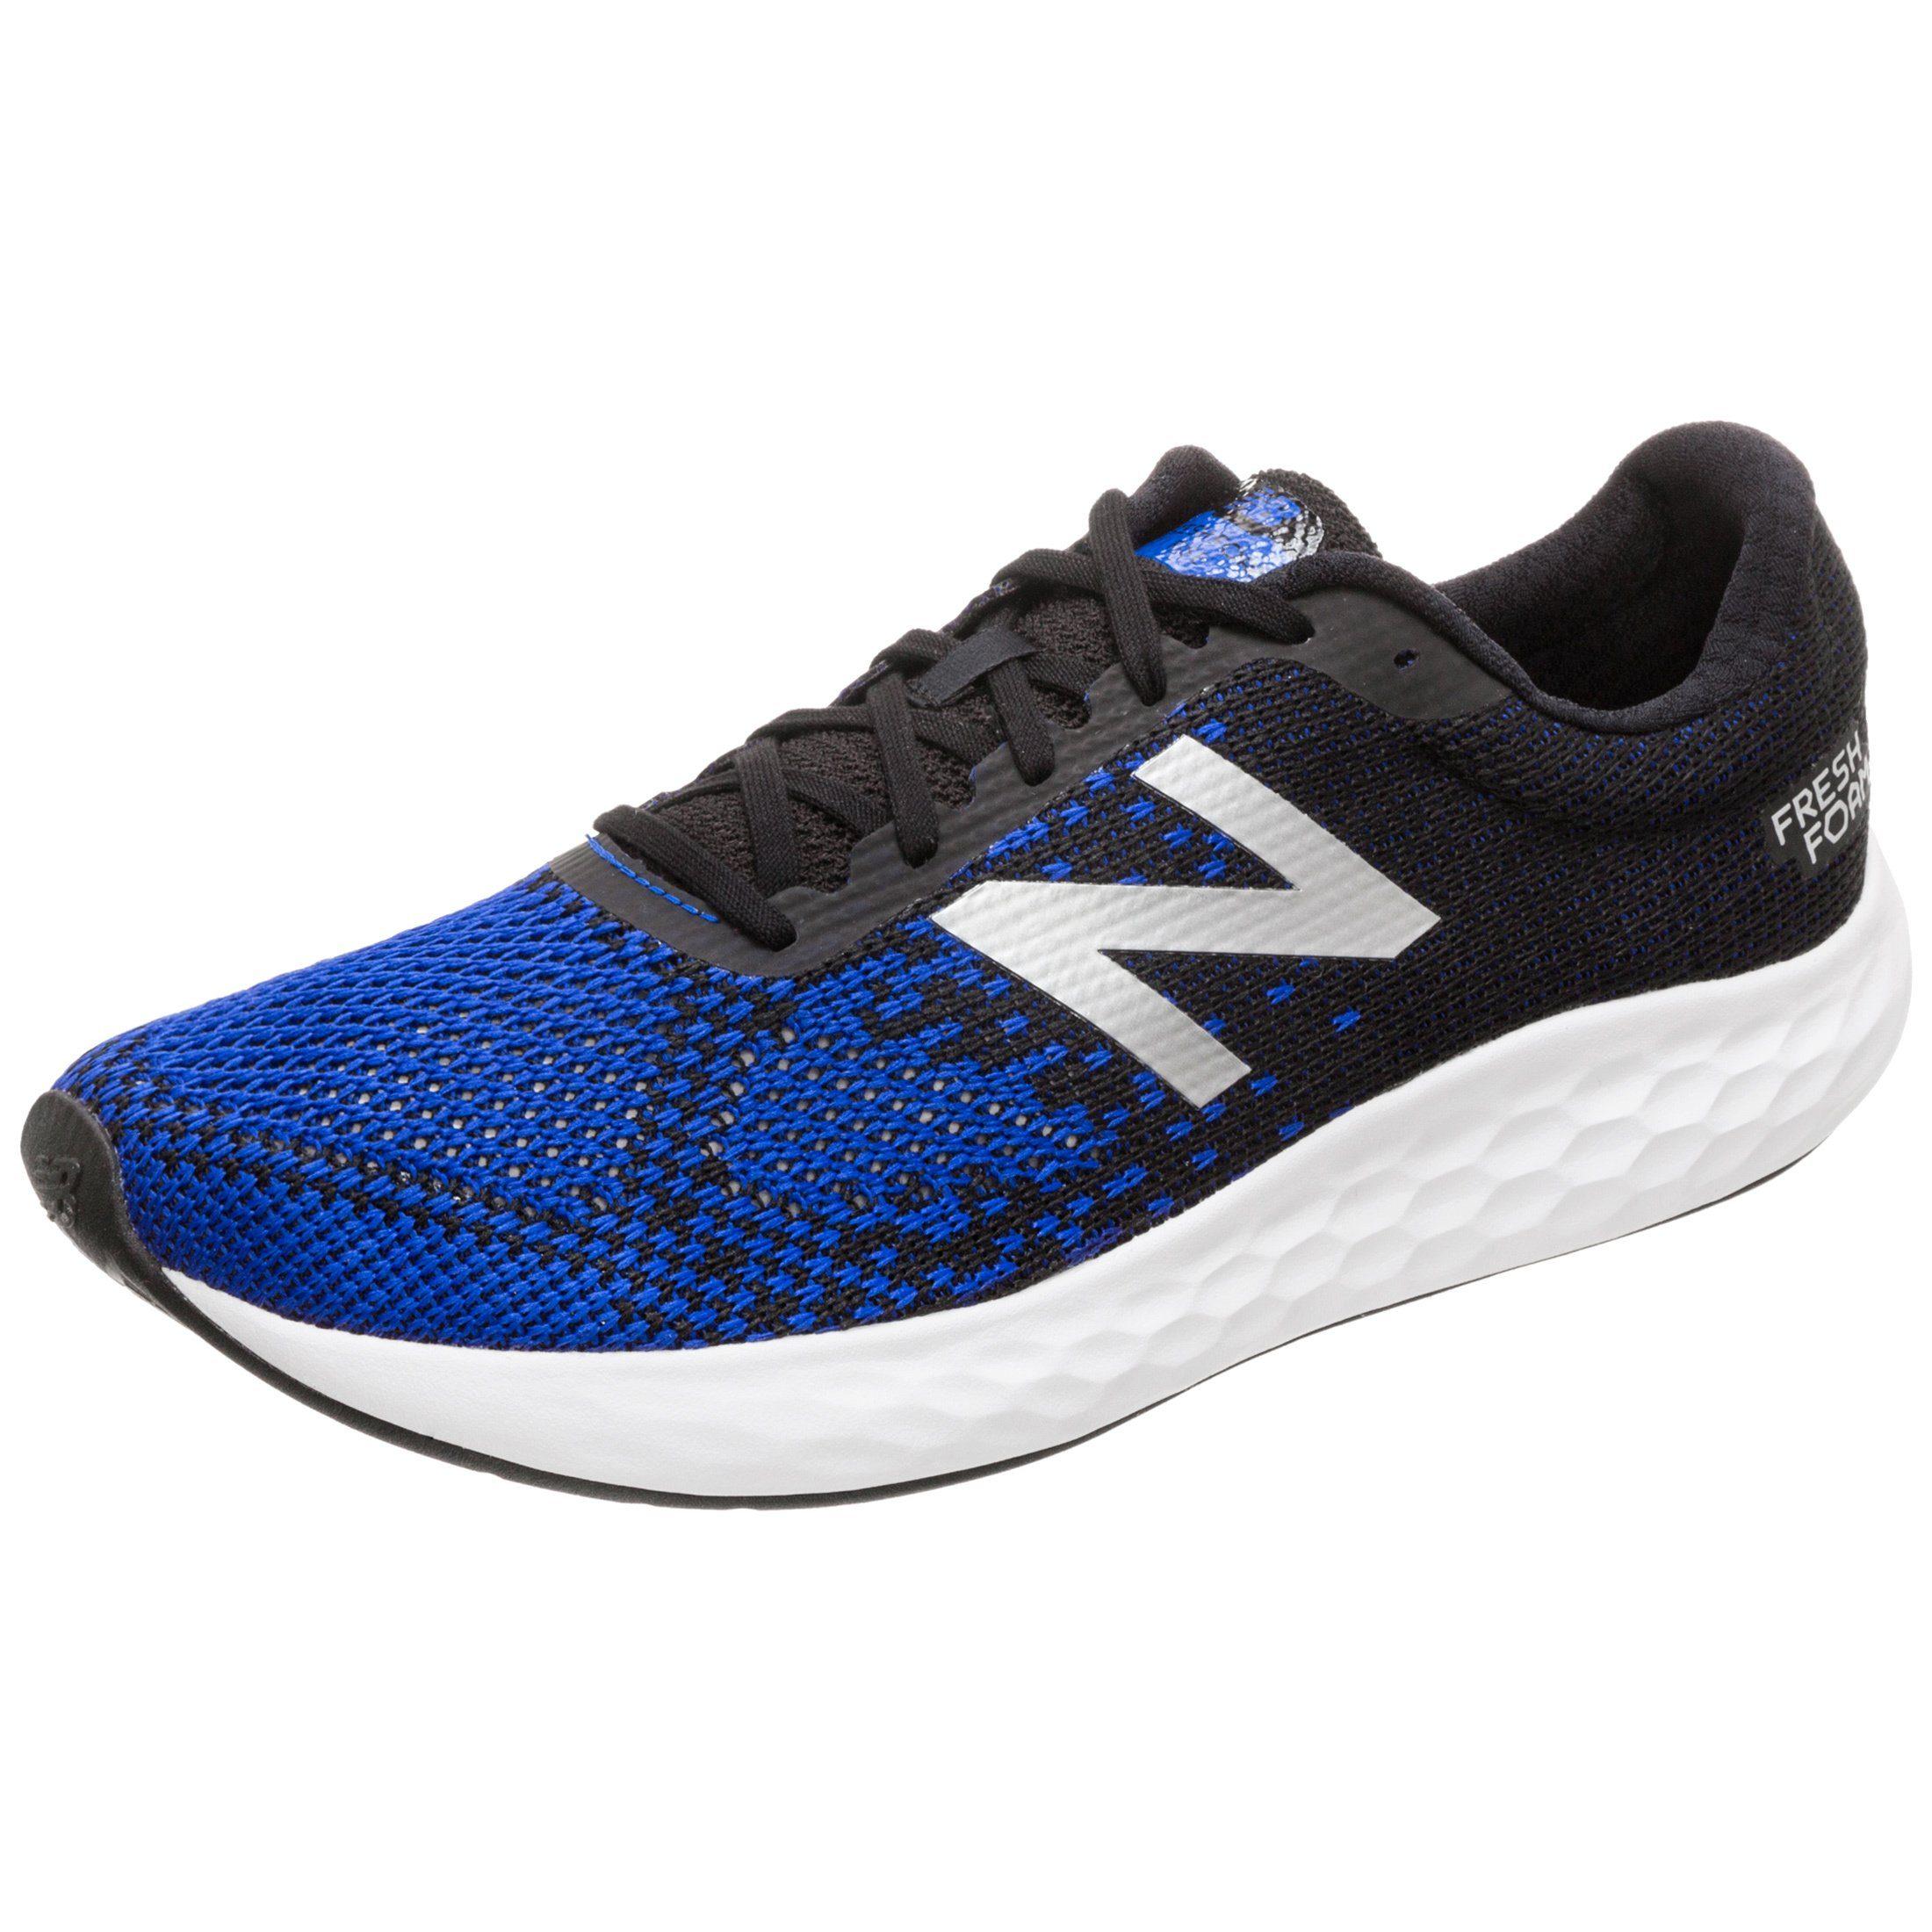 New Balance Laufschuh Freshfoam Rise   Schuhe > Sportschuhe > Laufschuhe   New Balance